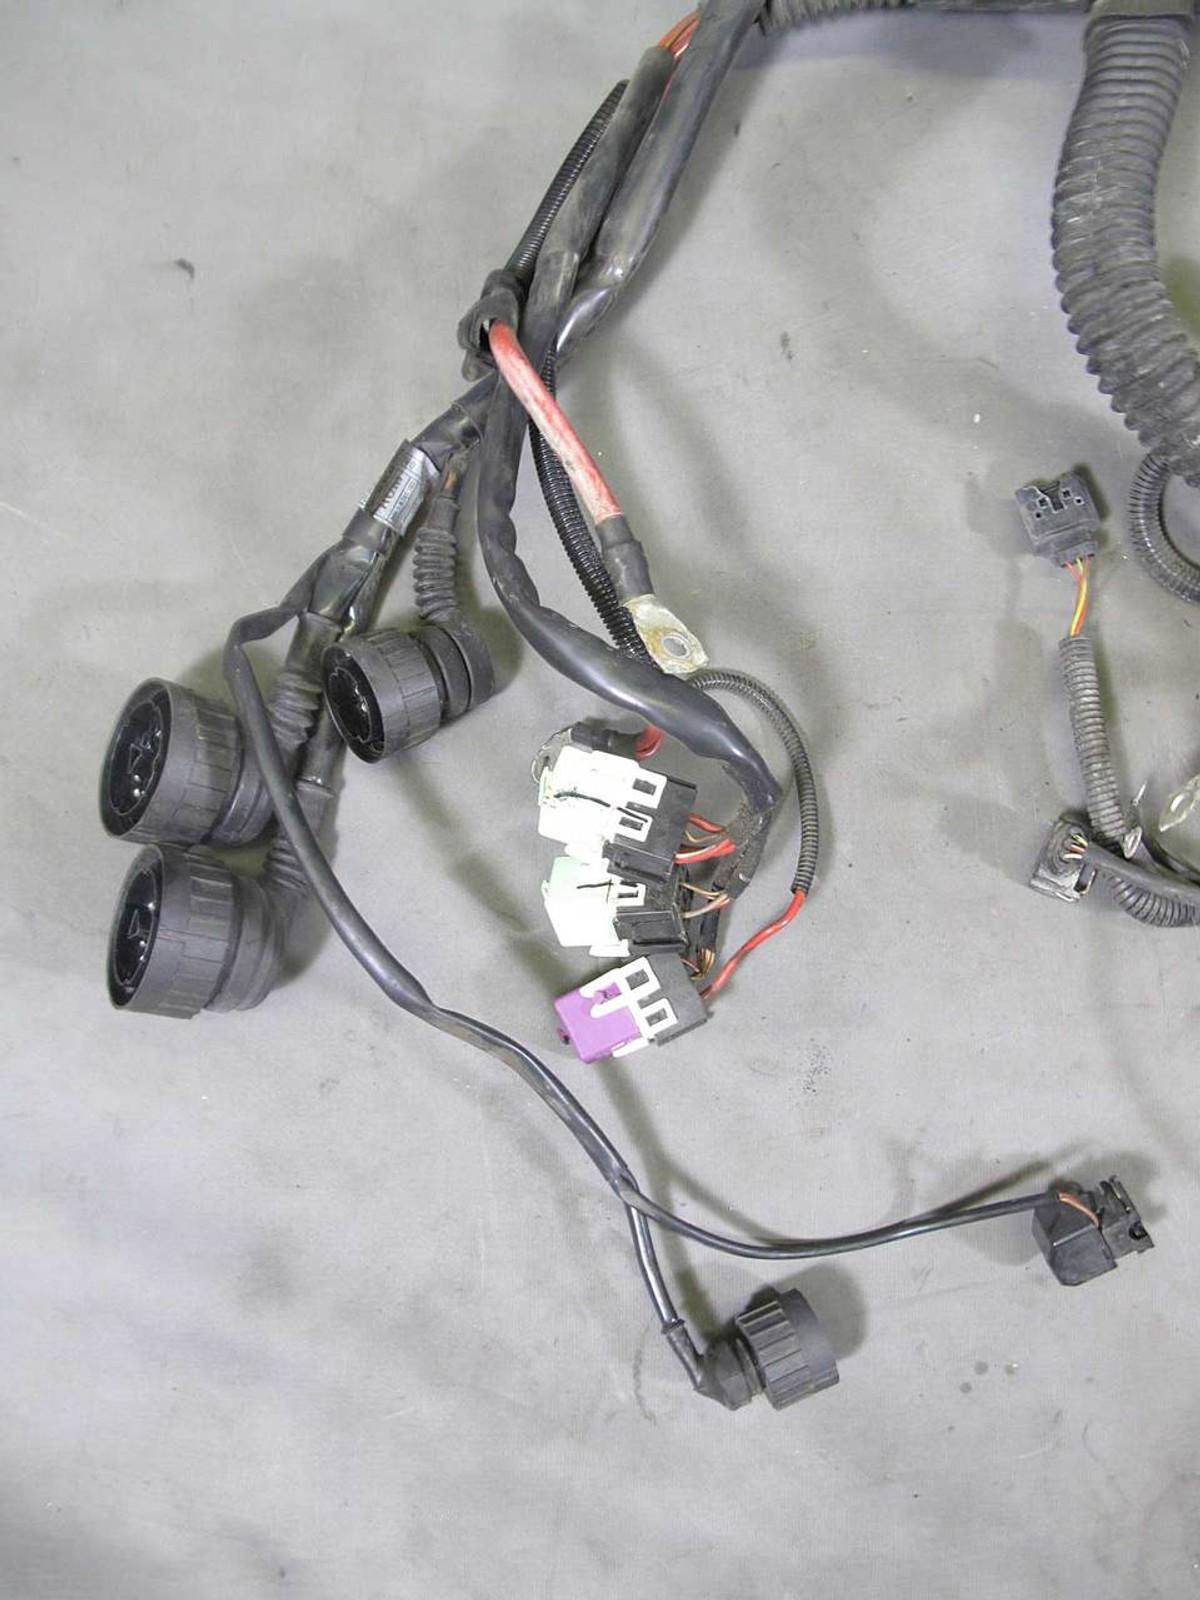 bmw e36 engine wiring harness manual asc t 97 98 99 328i 328is 328ic bmw e36 m50 engine wiring harness bmw e36 engine wiring harness [ 960 x 1280 Pixel ]